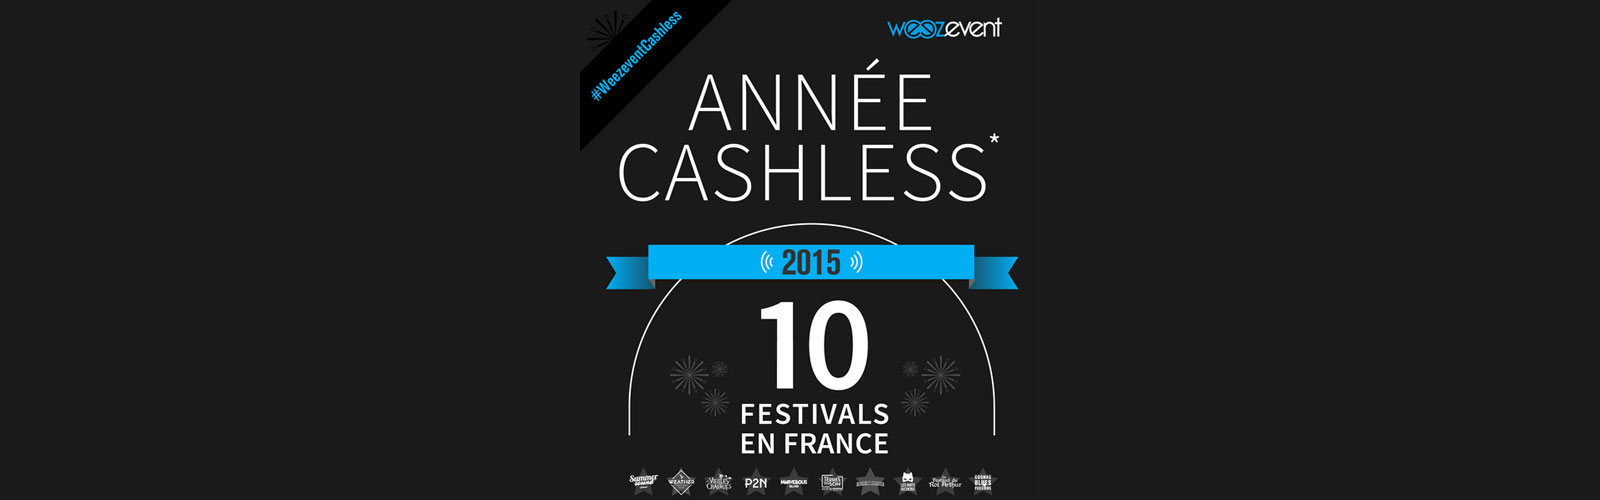 weezevent-infographie-cashless